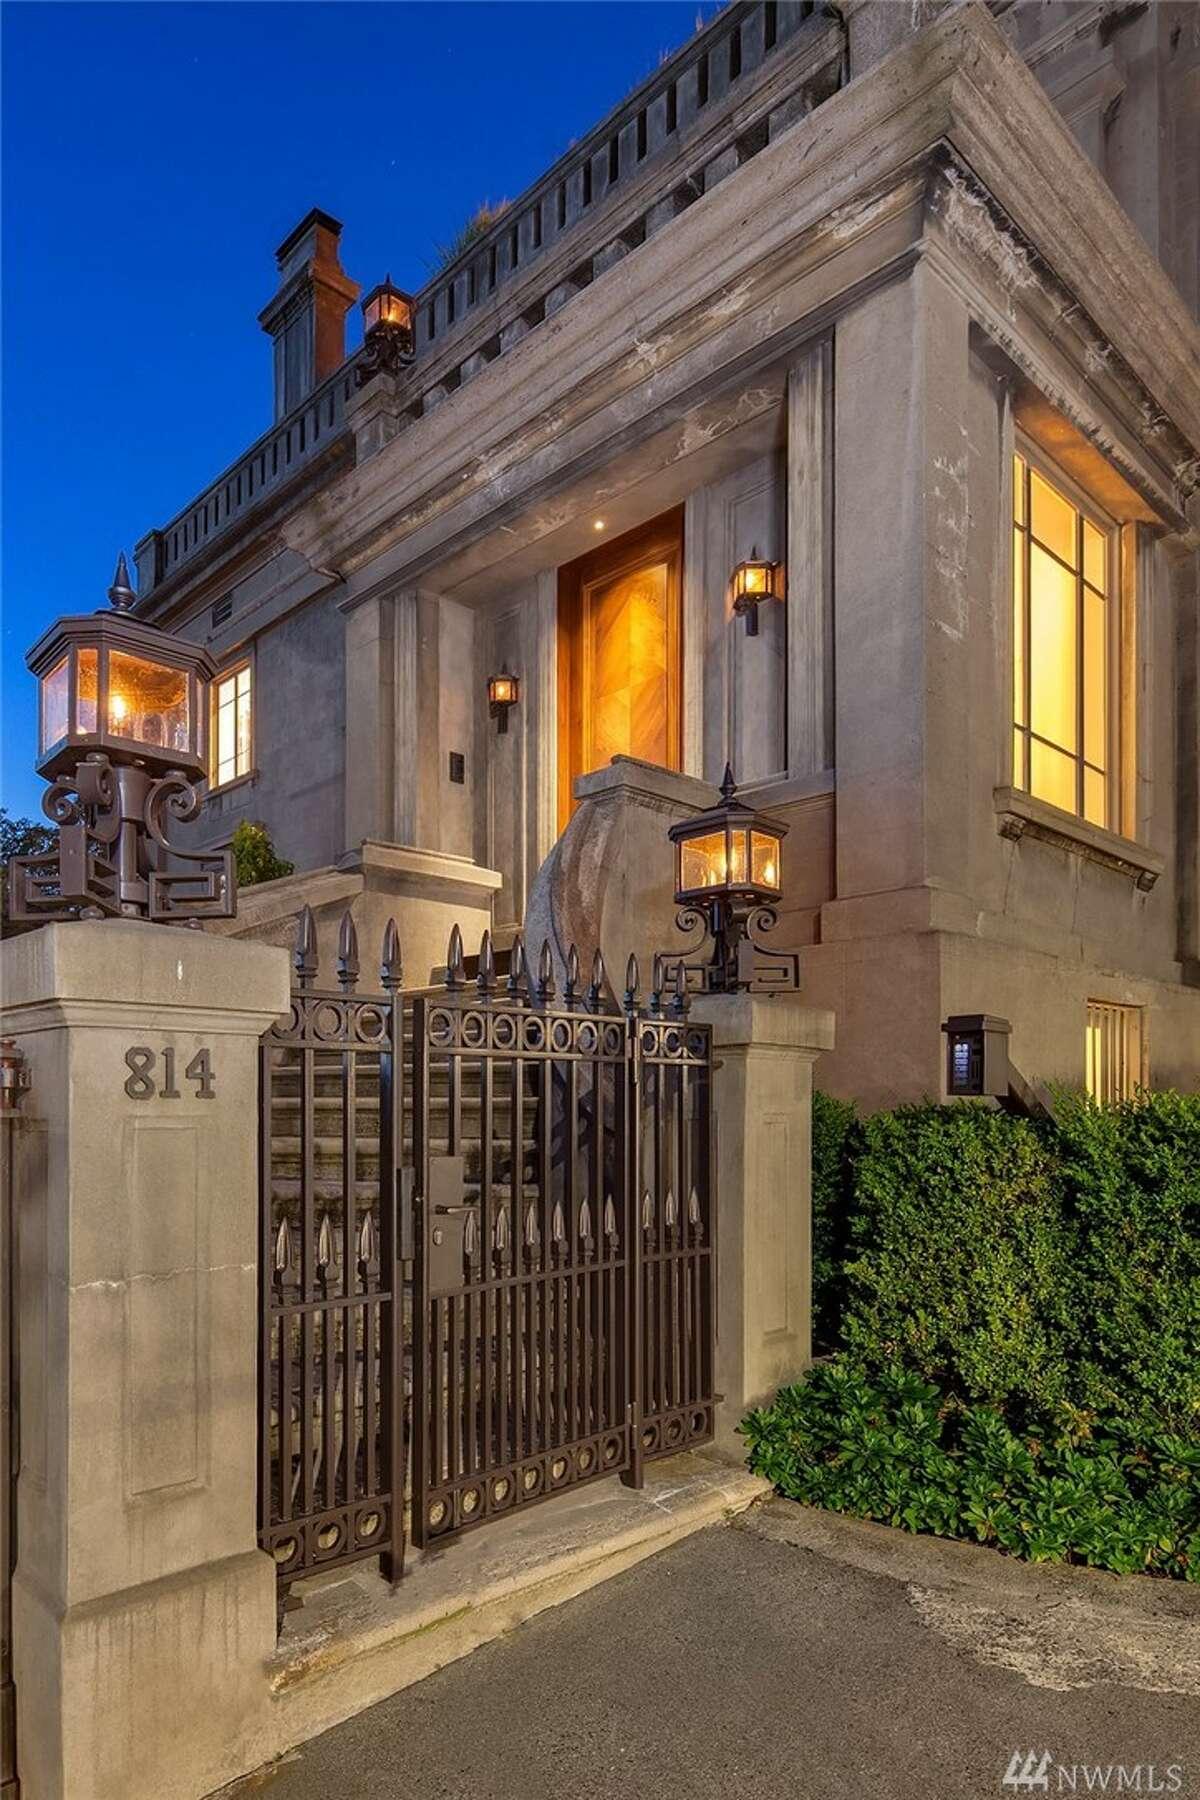 The Sam Hill Mansion.